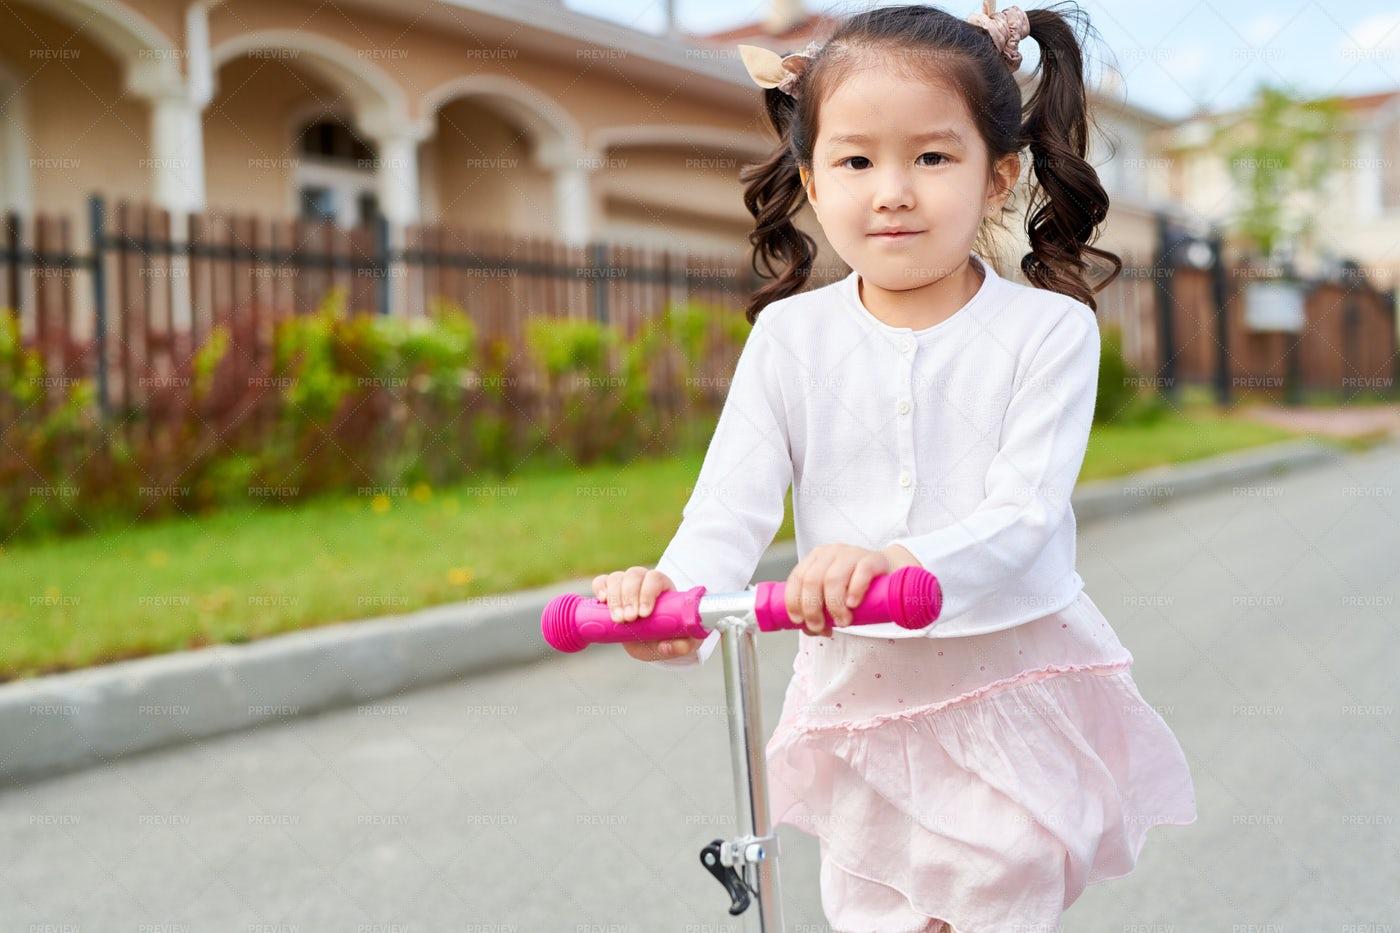 Little Asian Girl Riding Scooter: Stock Photos